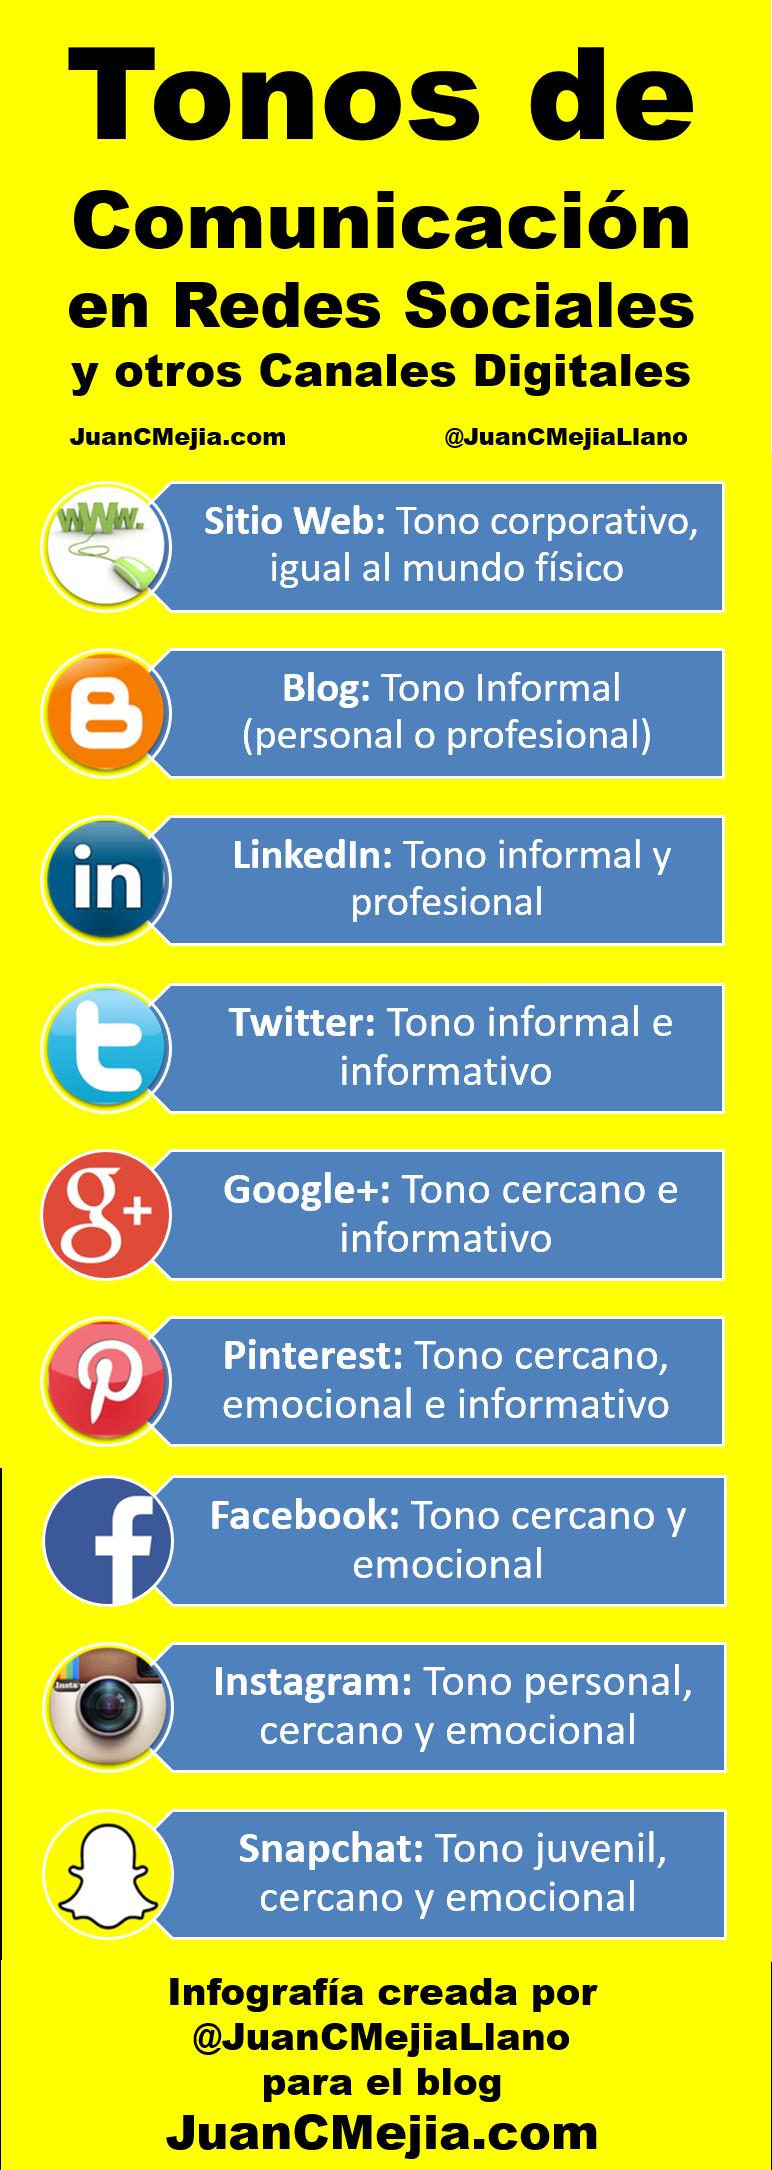 Tonos de comunicación en Redes Sociales